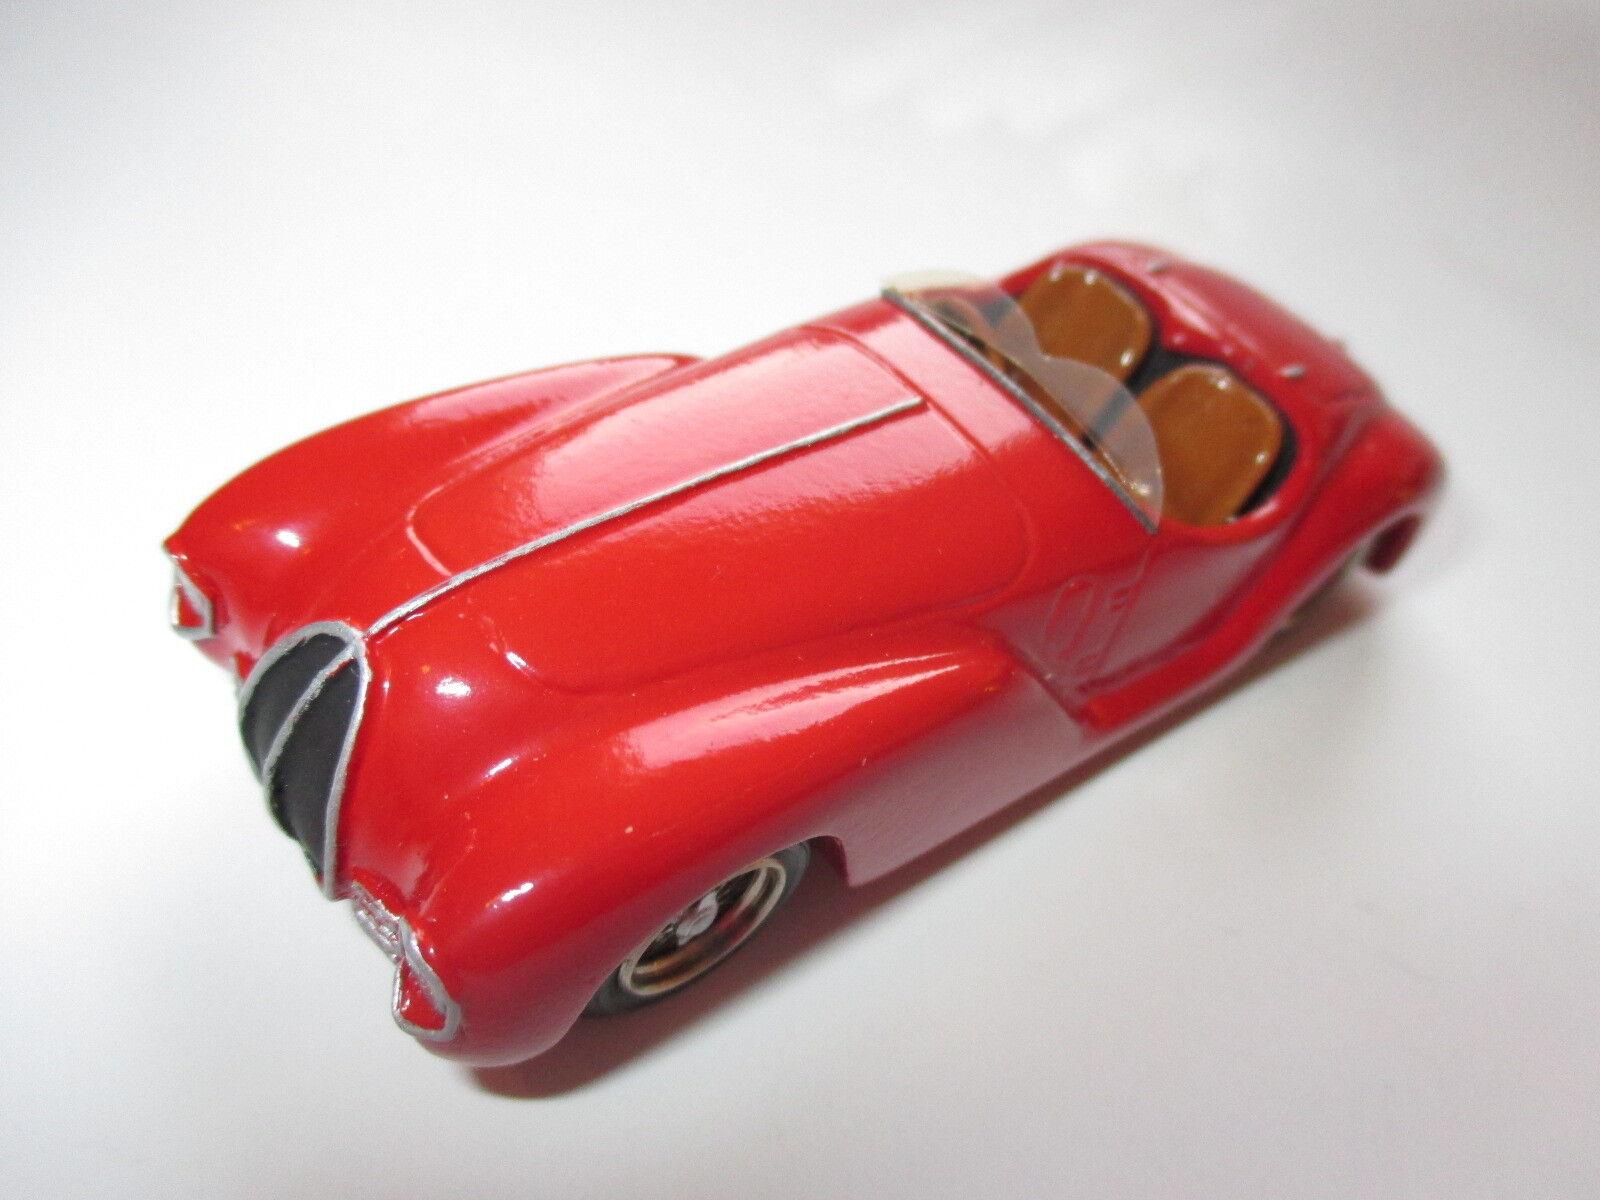 Ferrari 815 (1940) in Red, Handmade Handwork ARTIGIANA No. 1 in 1 43